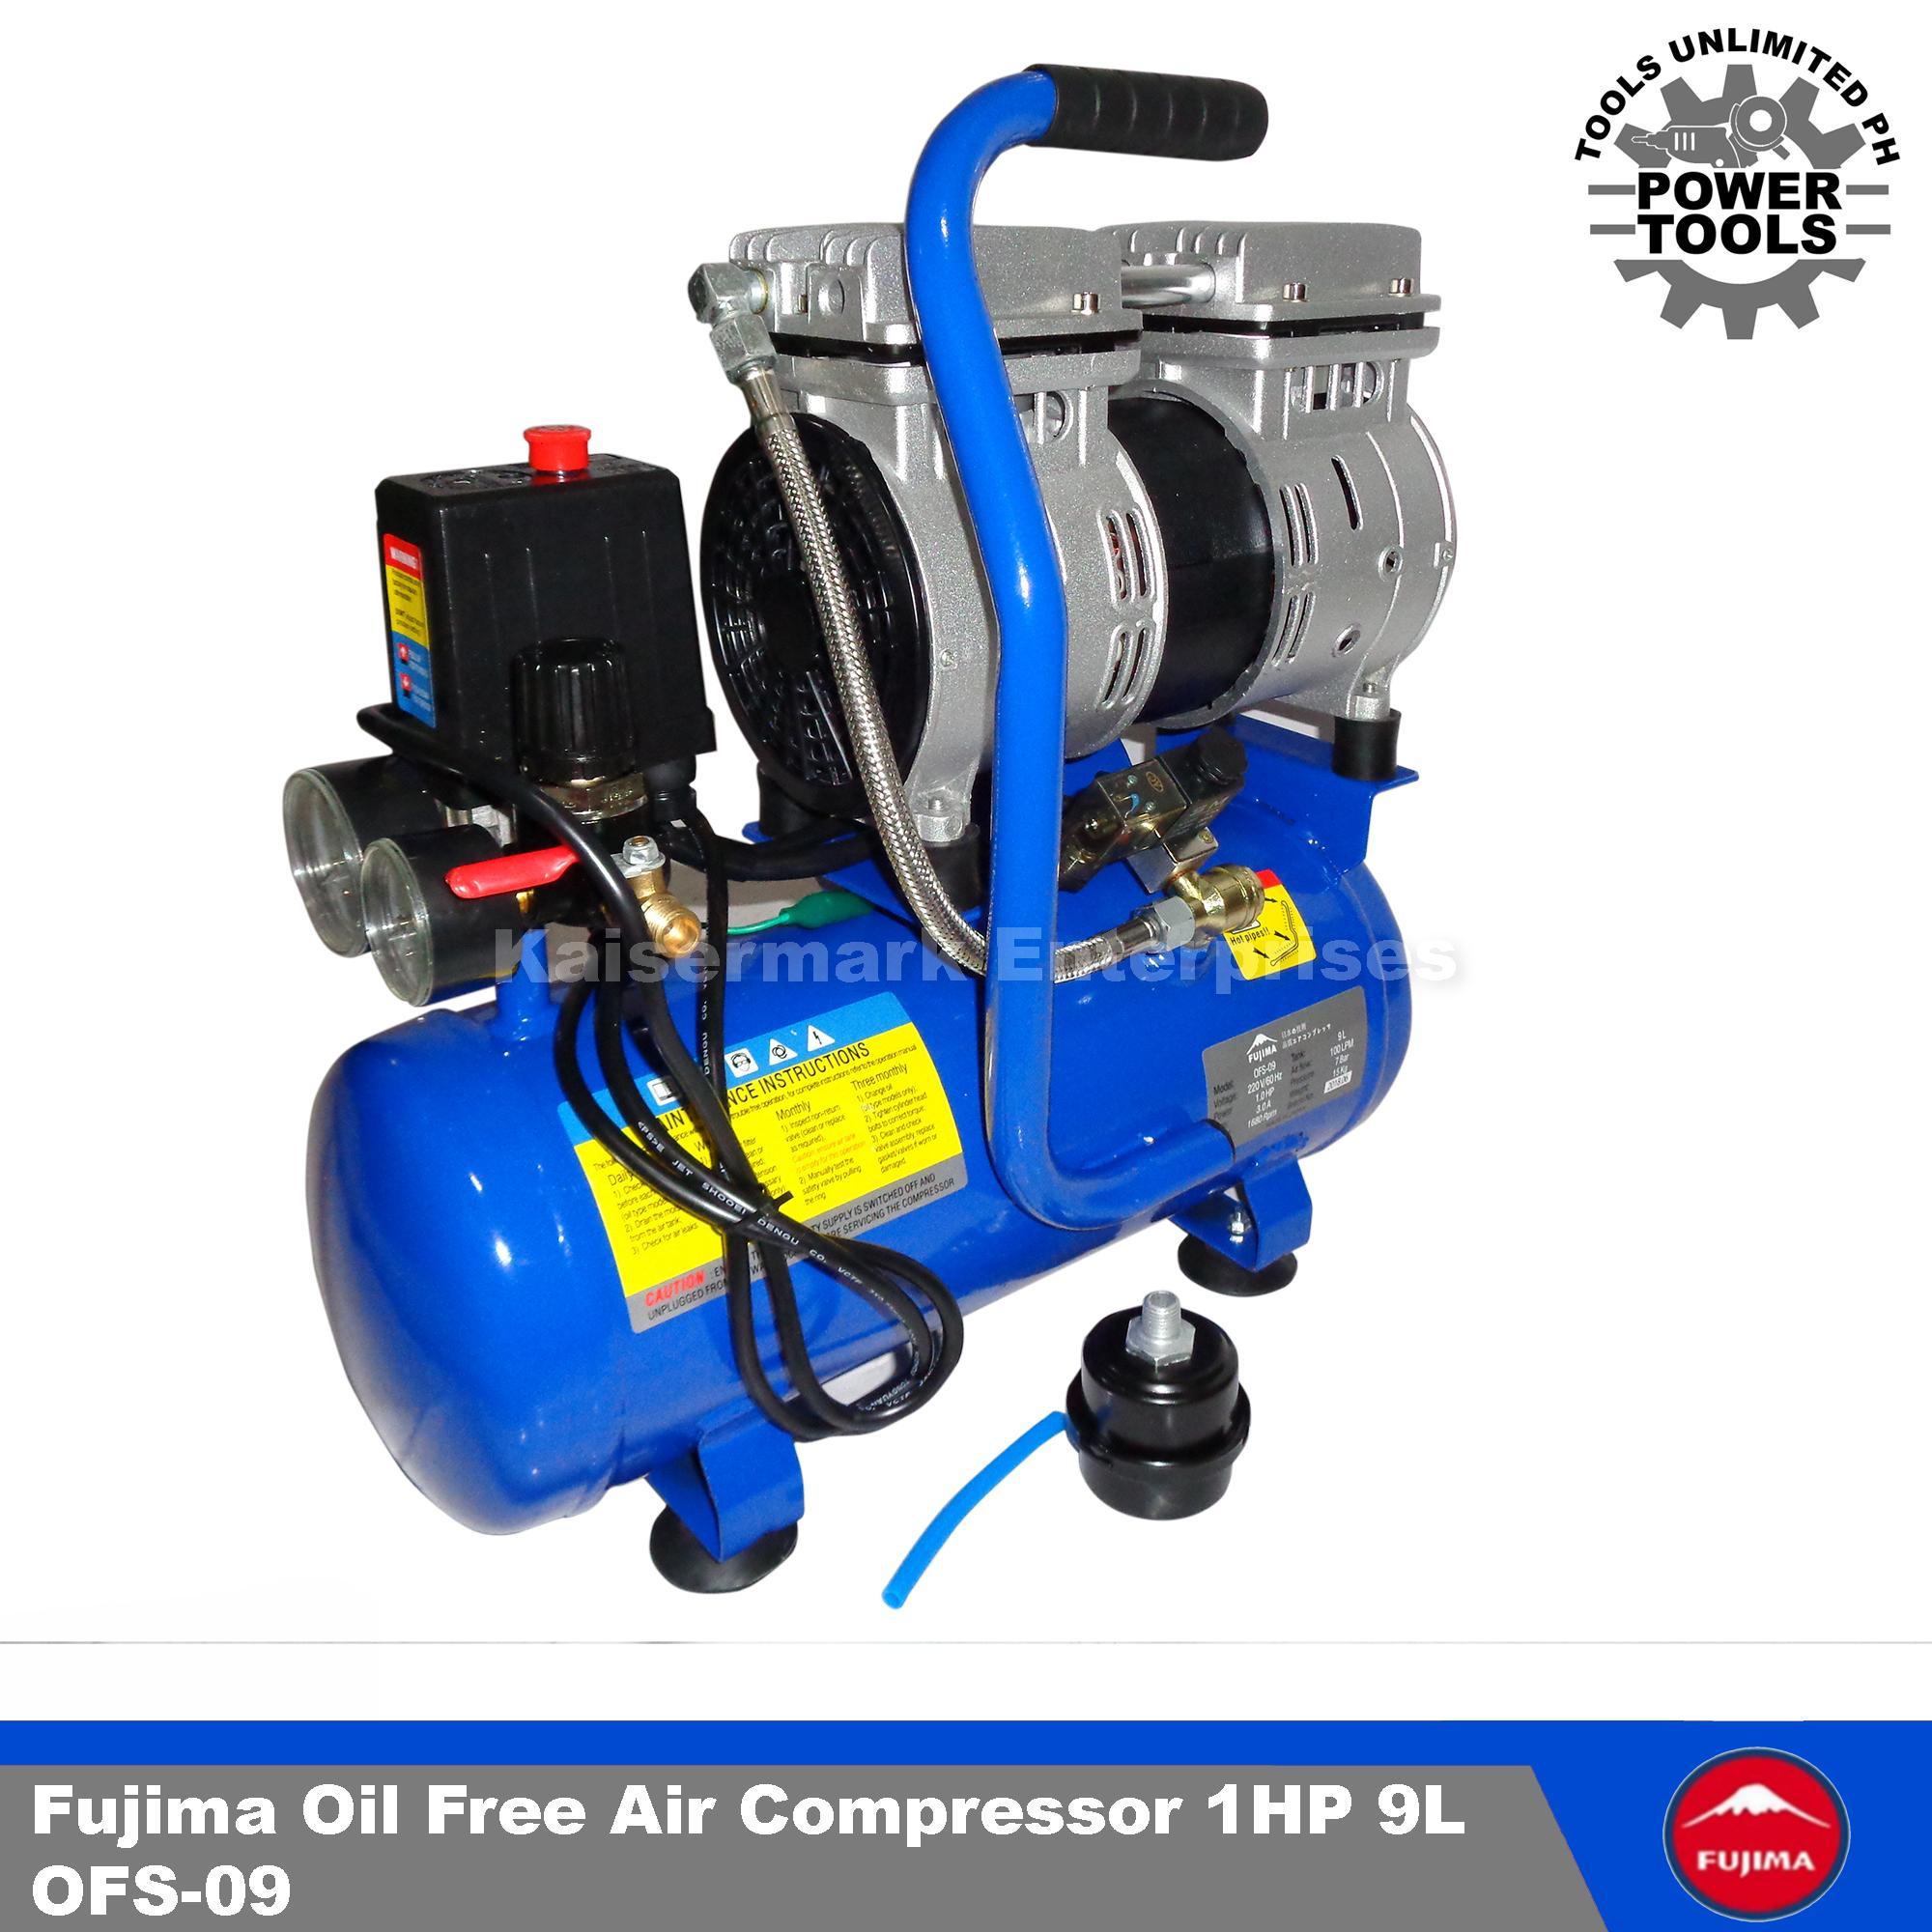 Fujima Philippines Price List Pressure Washer Air Compressors Wiring Schematic For 2 Oil Free Compressor 1hp 9l Silent Type